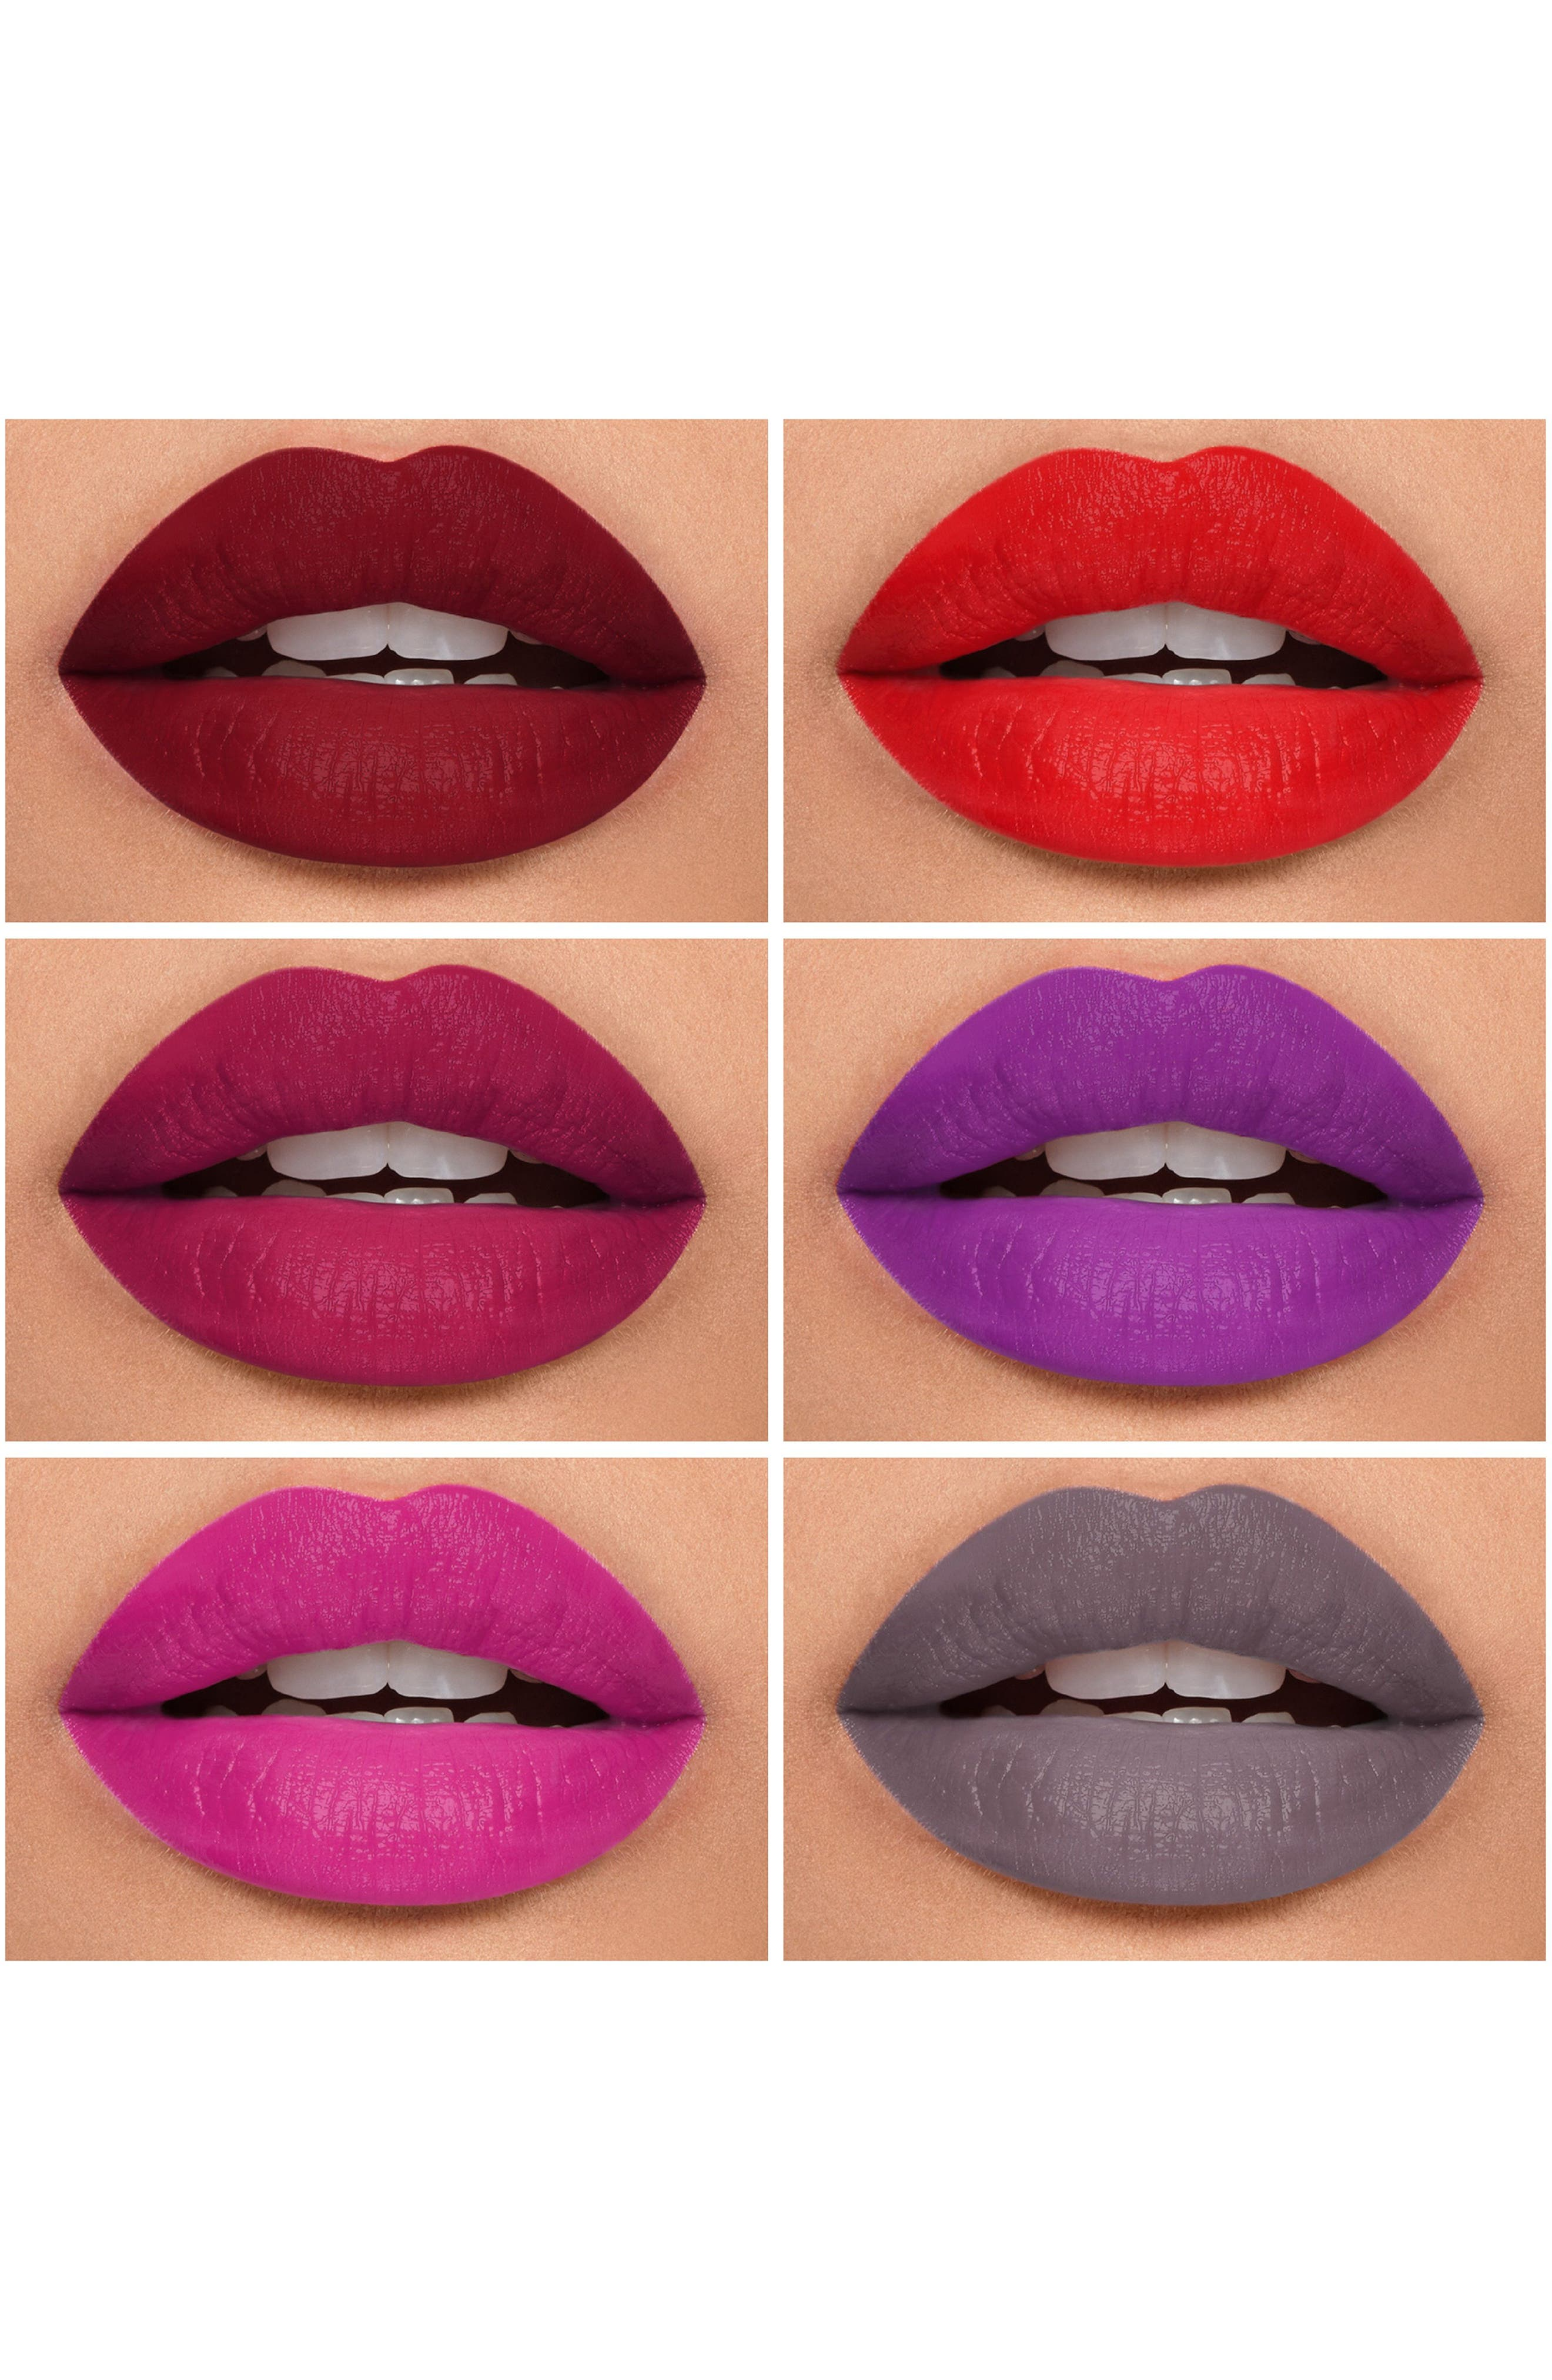 Be Legendary Pucker Up Lipstick Palette,                             Alternate thumbnail 6, color,                             BOLD